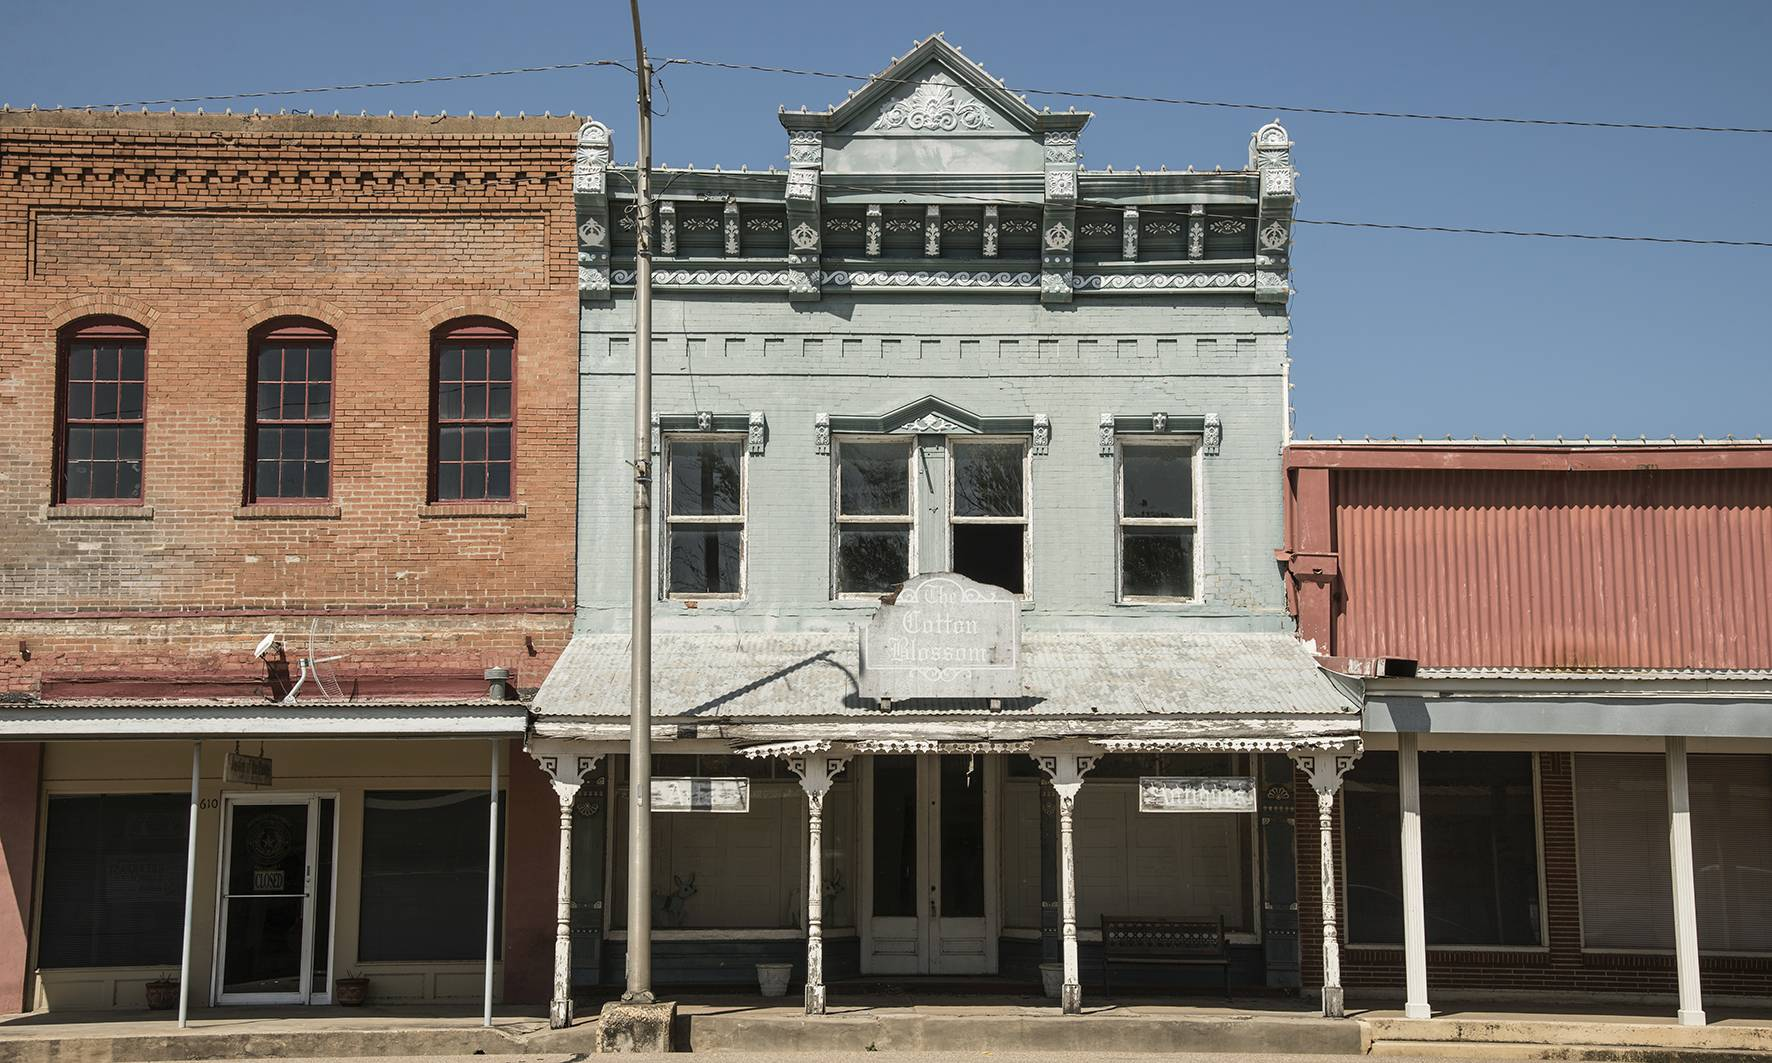 7 Far Fading West, Cotton Blossom, 2015